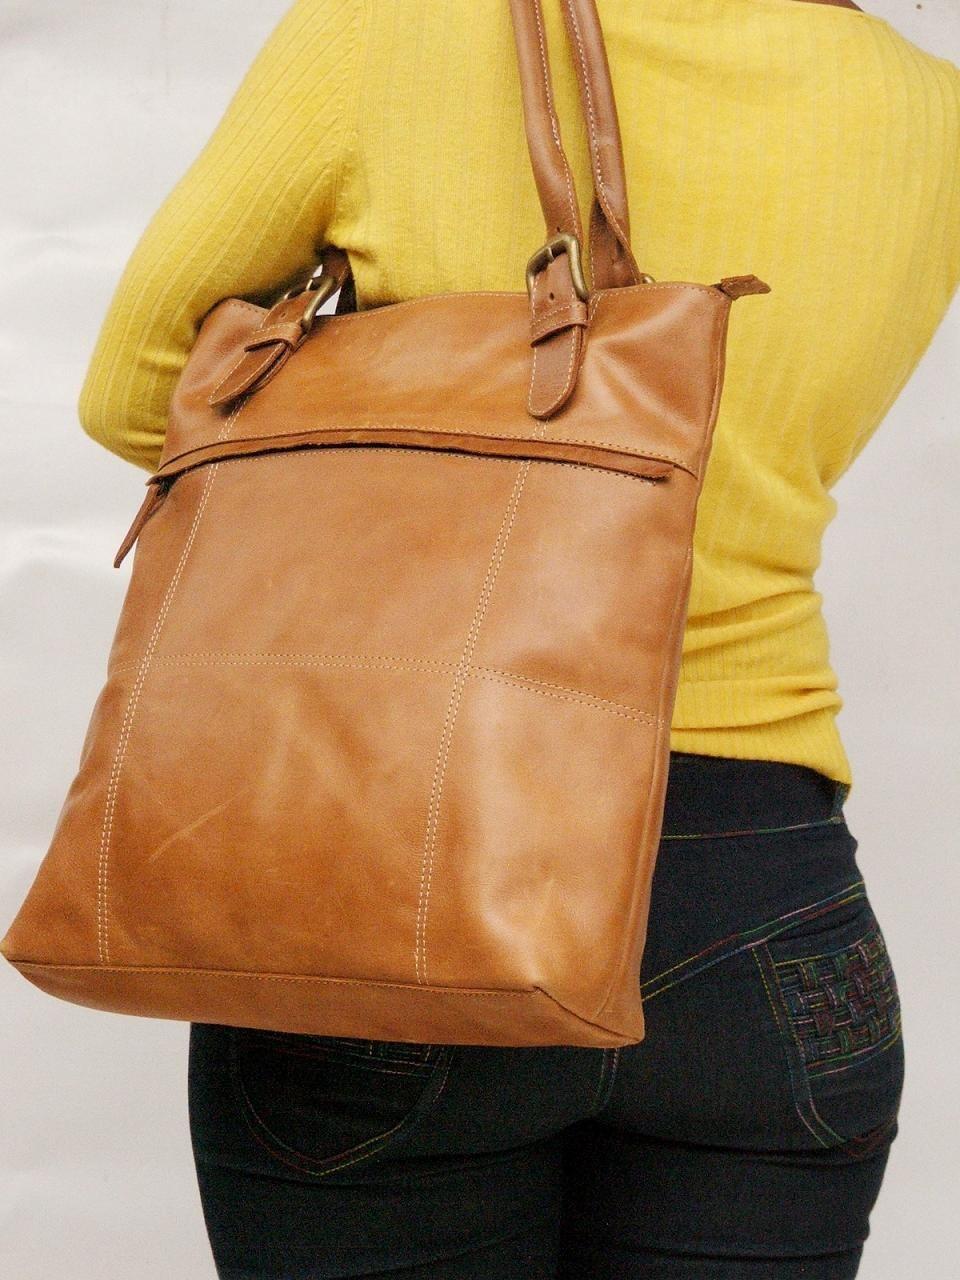 fd50e6dccf Leather tote bag light brown bag market bag library bag every day leather  bag laptop bag over the shoulder bag women s ...